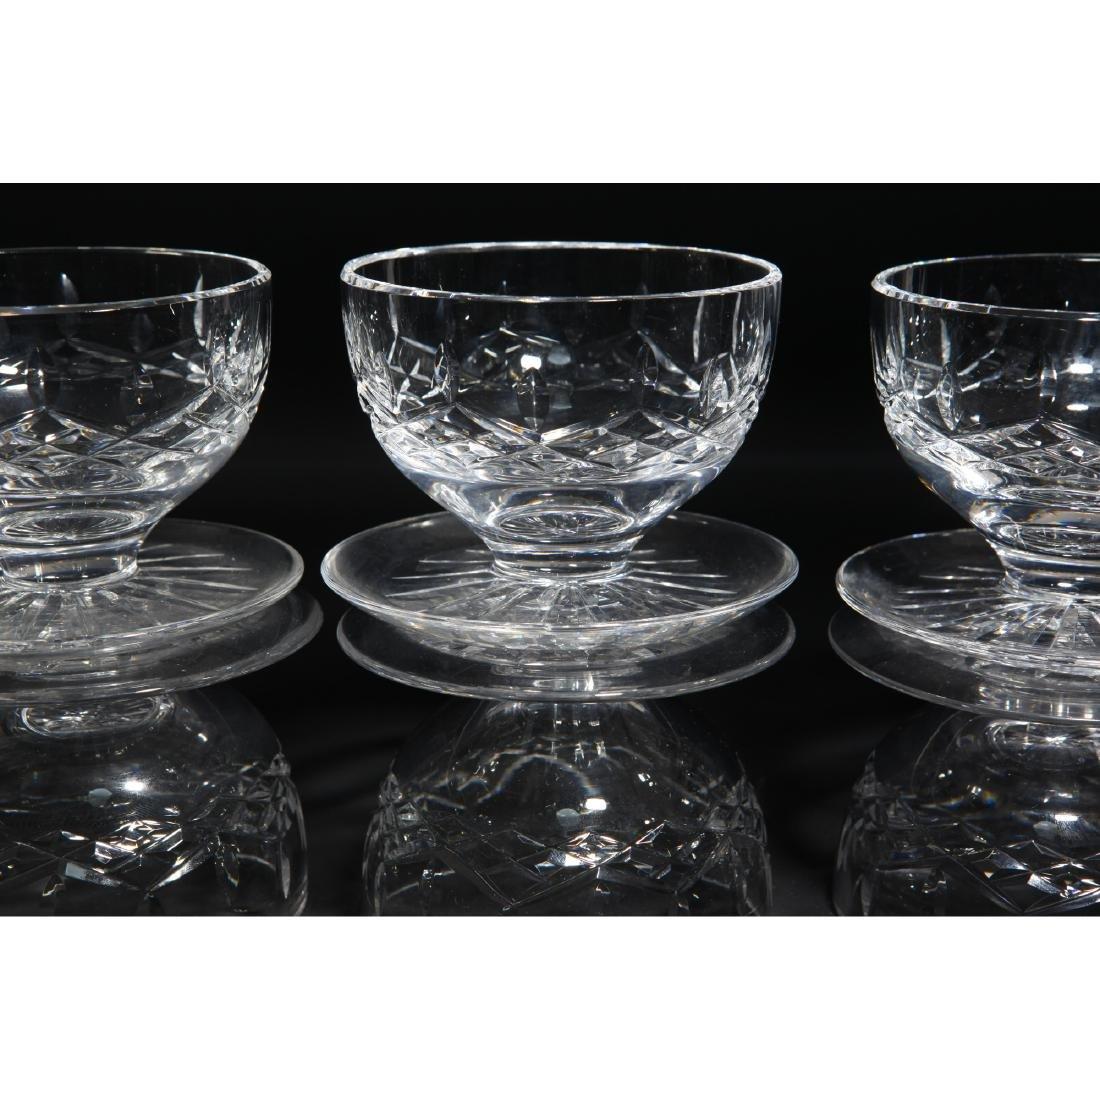 8PC WATERFORD LISMORE GLASSES, CLOCK, PEN HOLDER - 9